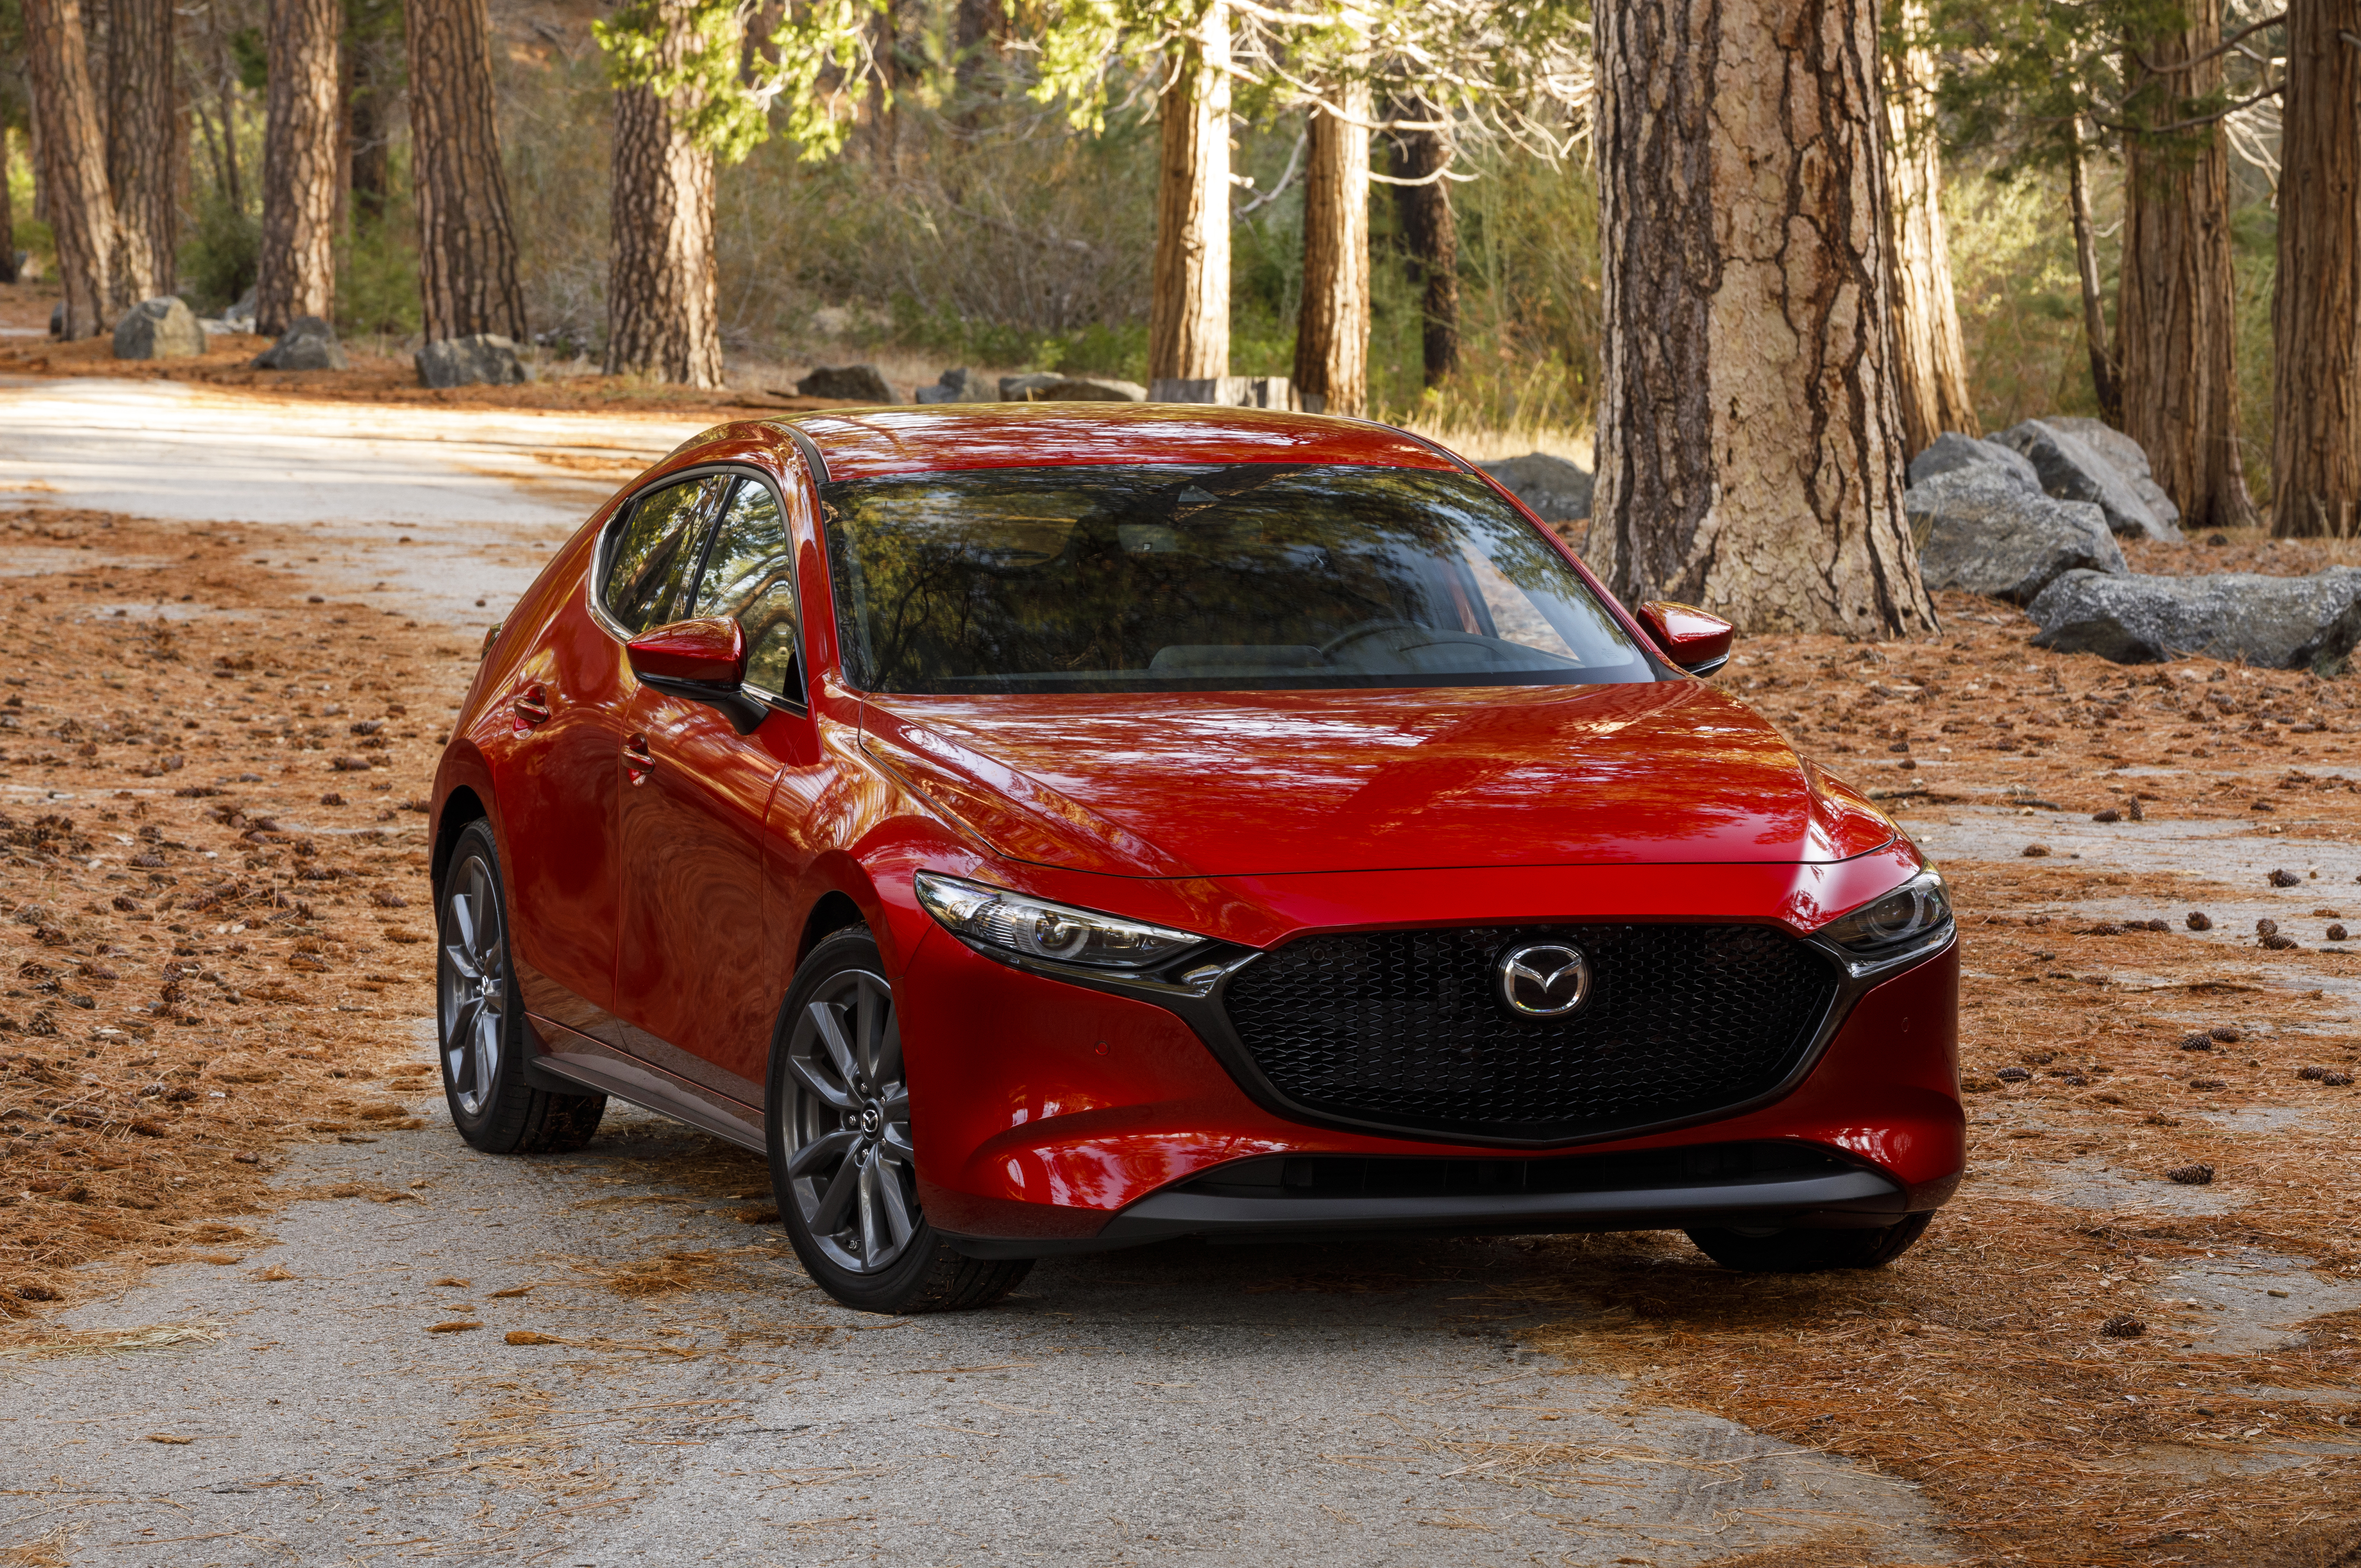 2019-Mazda3-Hatchback_01